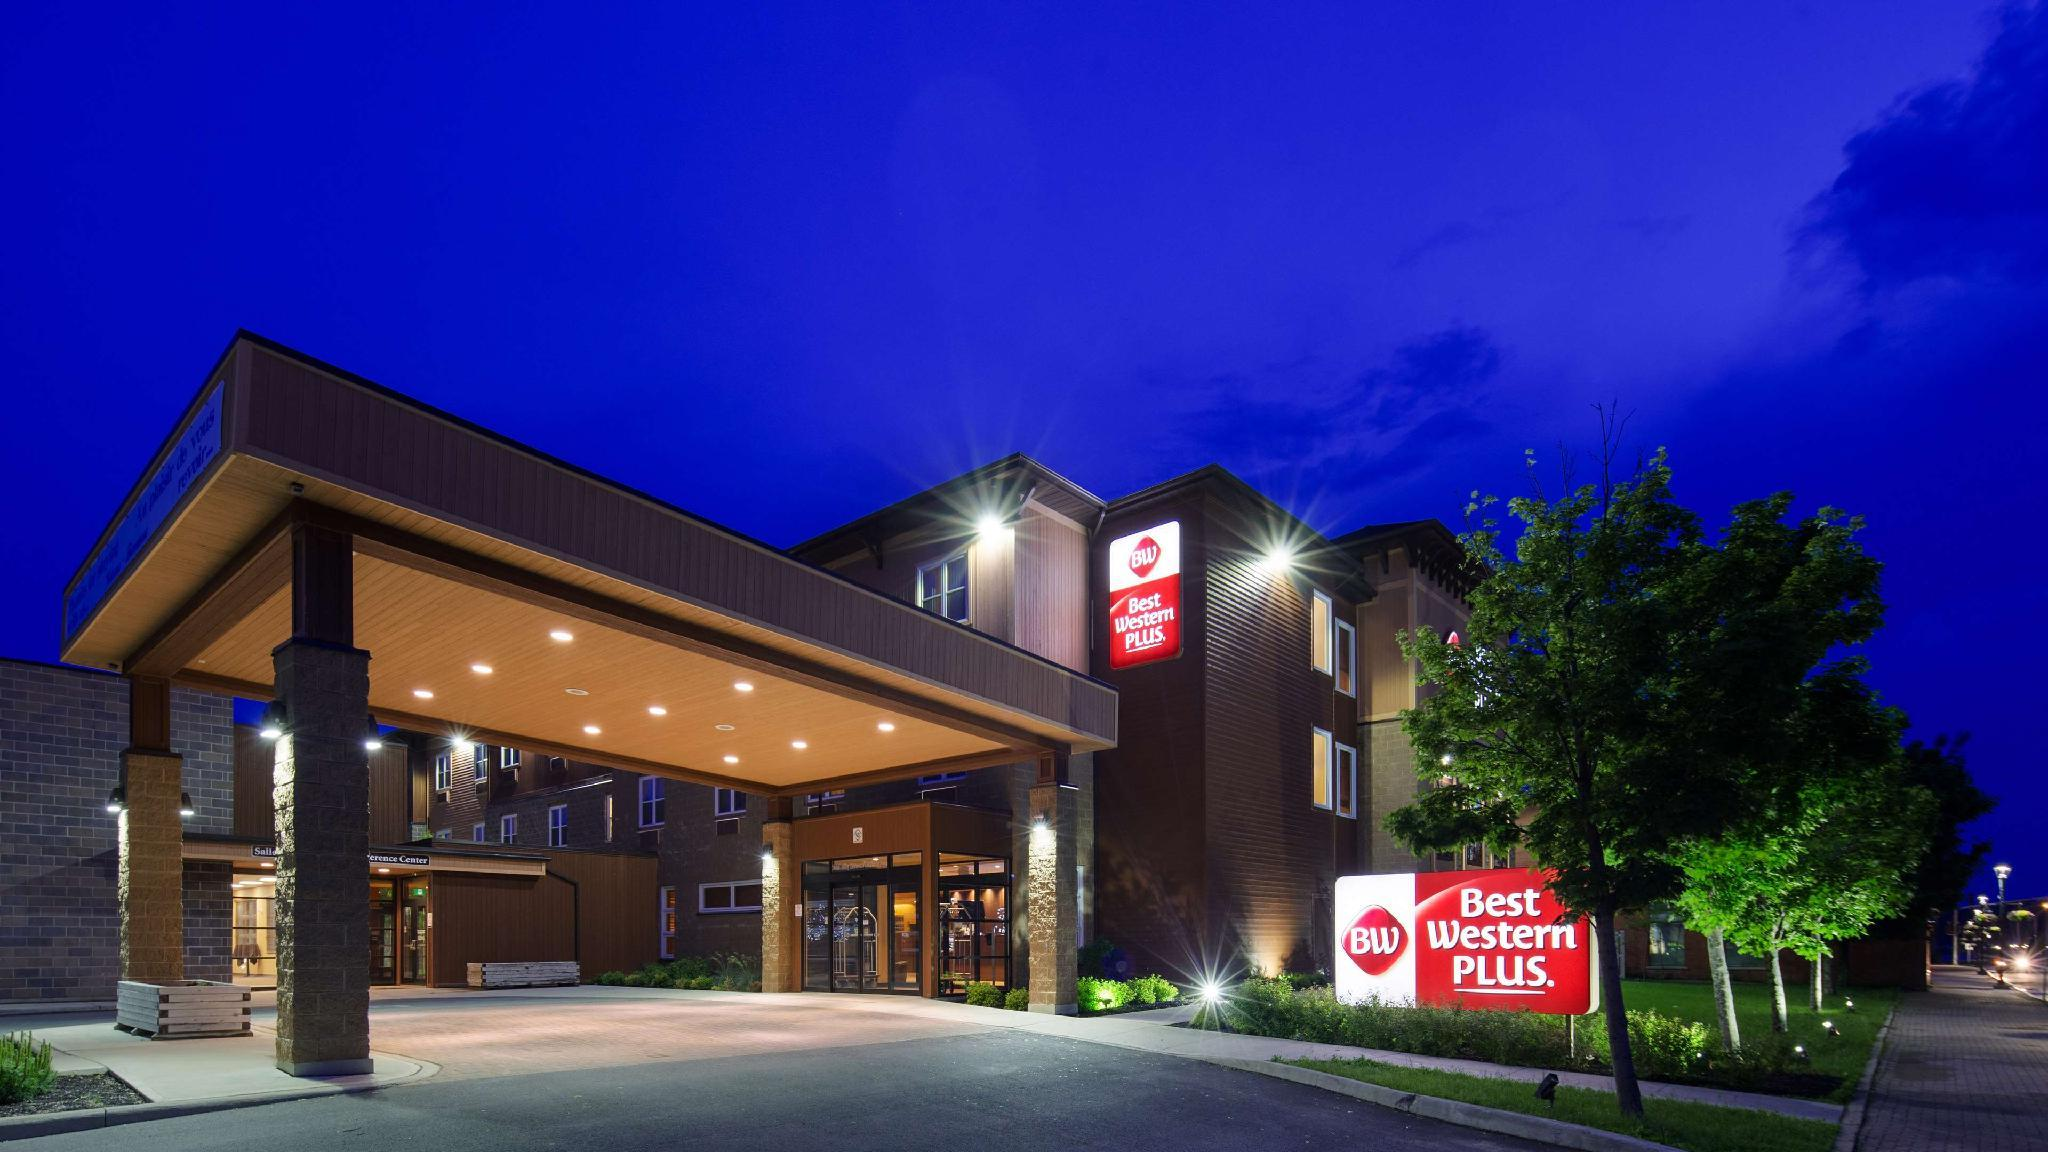 Best Western Plus Bathurst Hotel And Suites